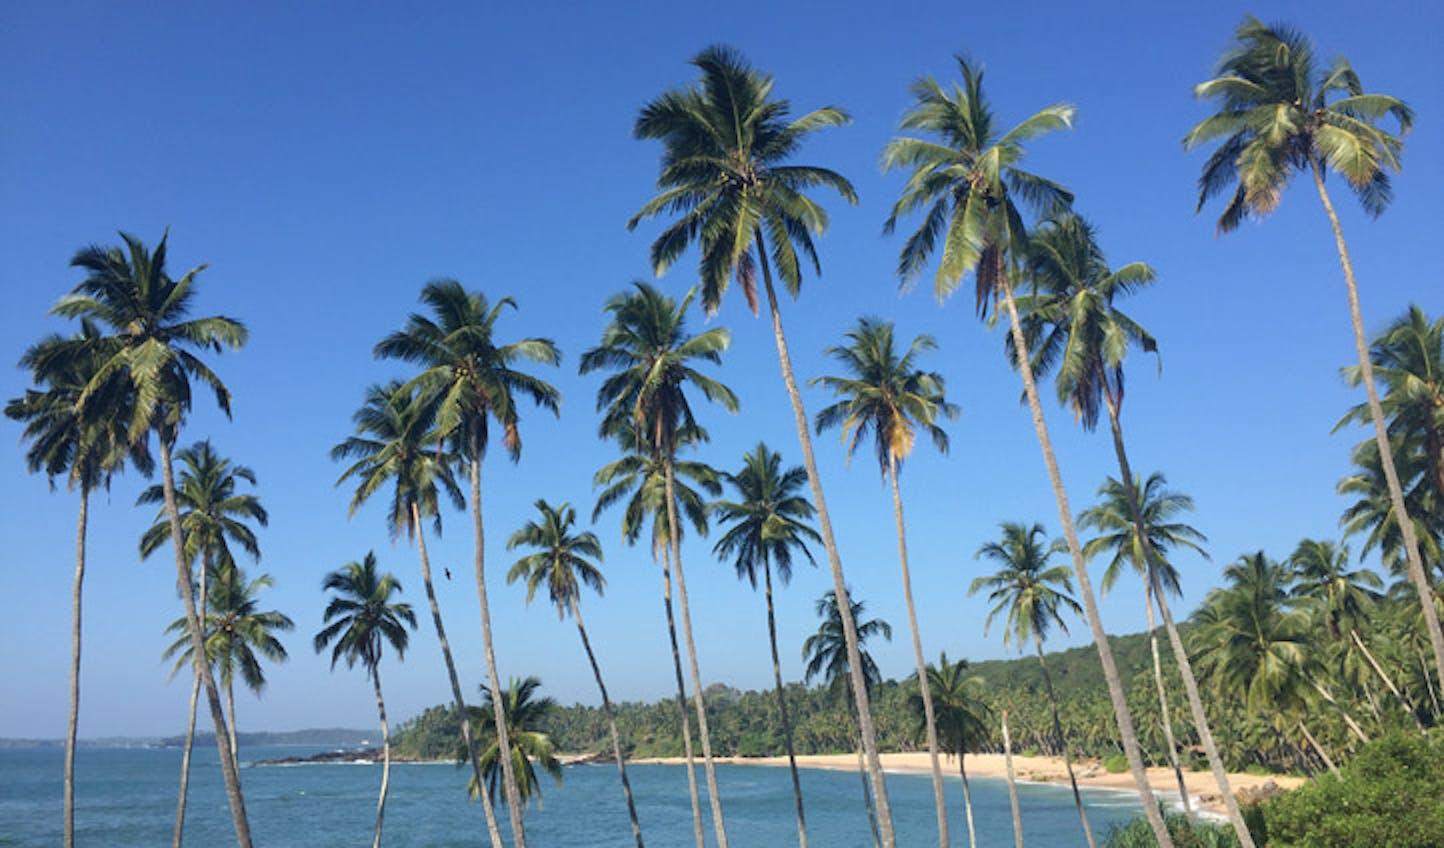 The tropical quintessence of Sri Lanka